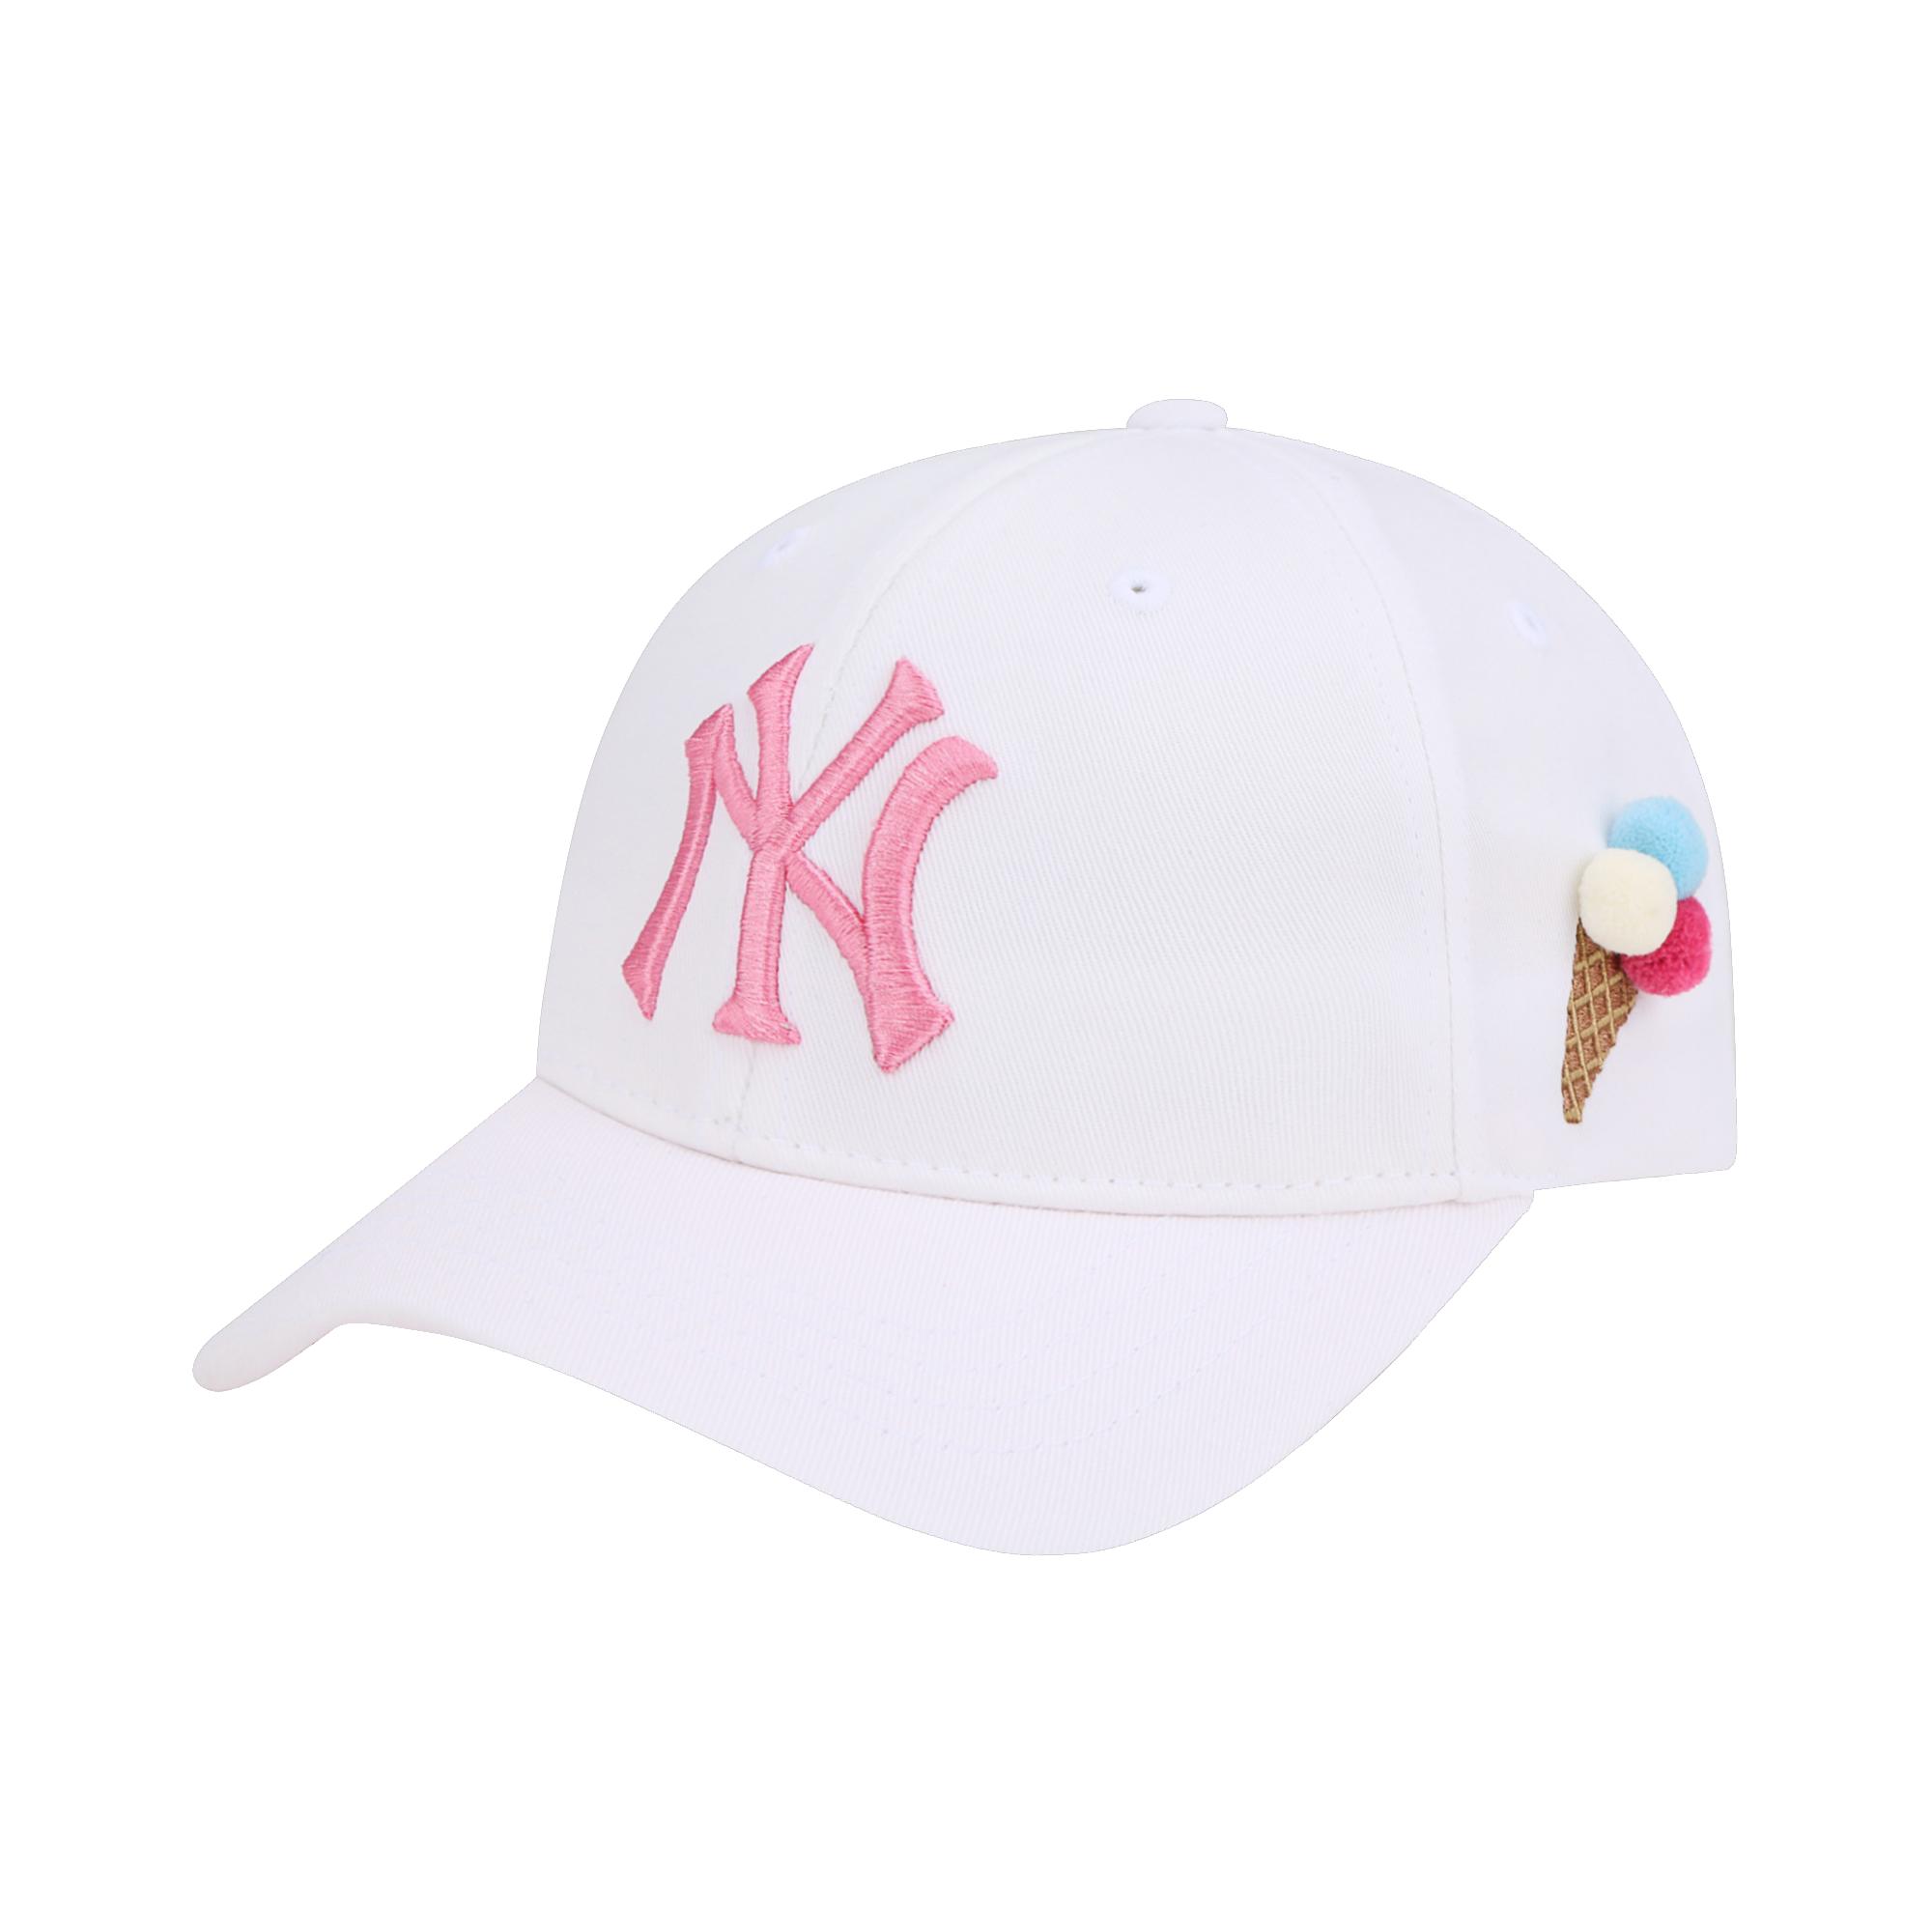 NEW YORK YANKEES ICE CREAM POM POM CURVED CAP